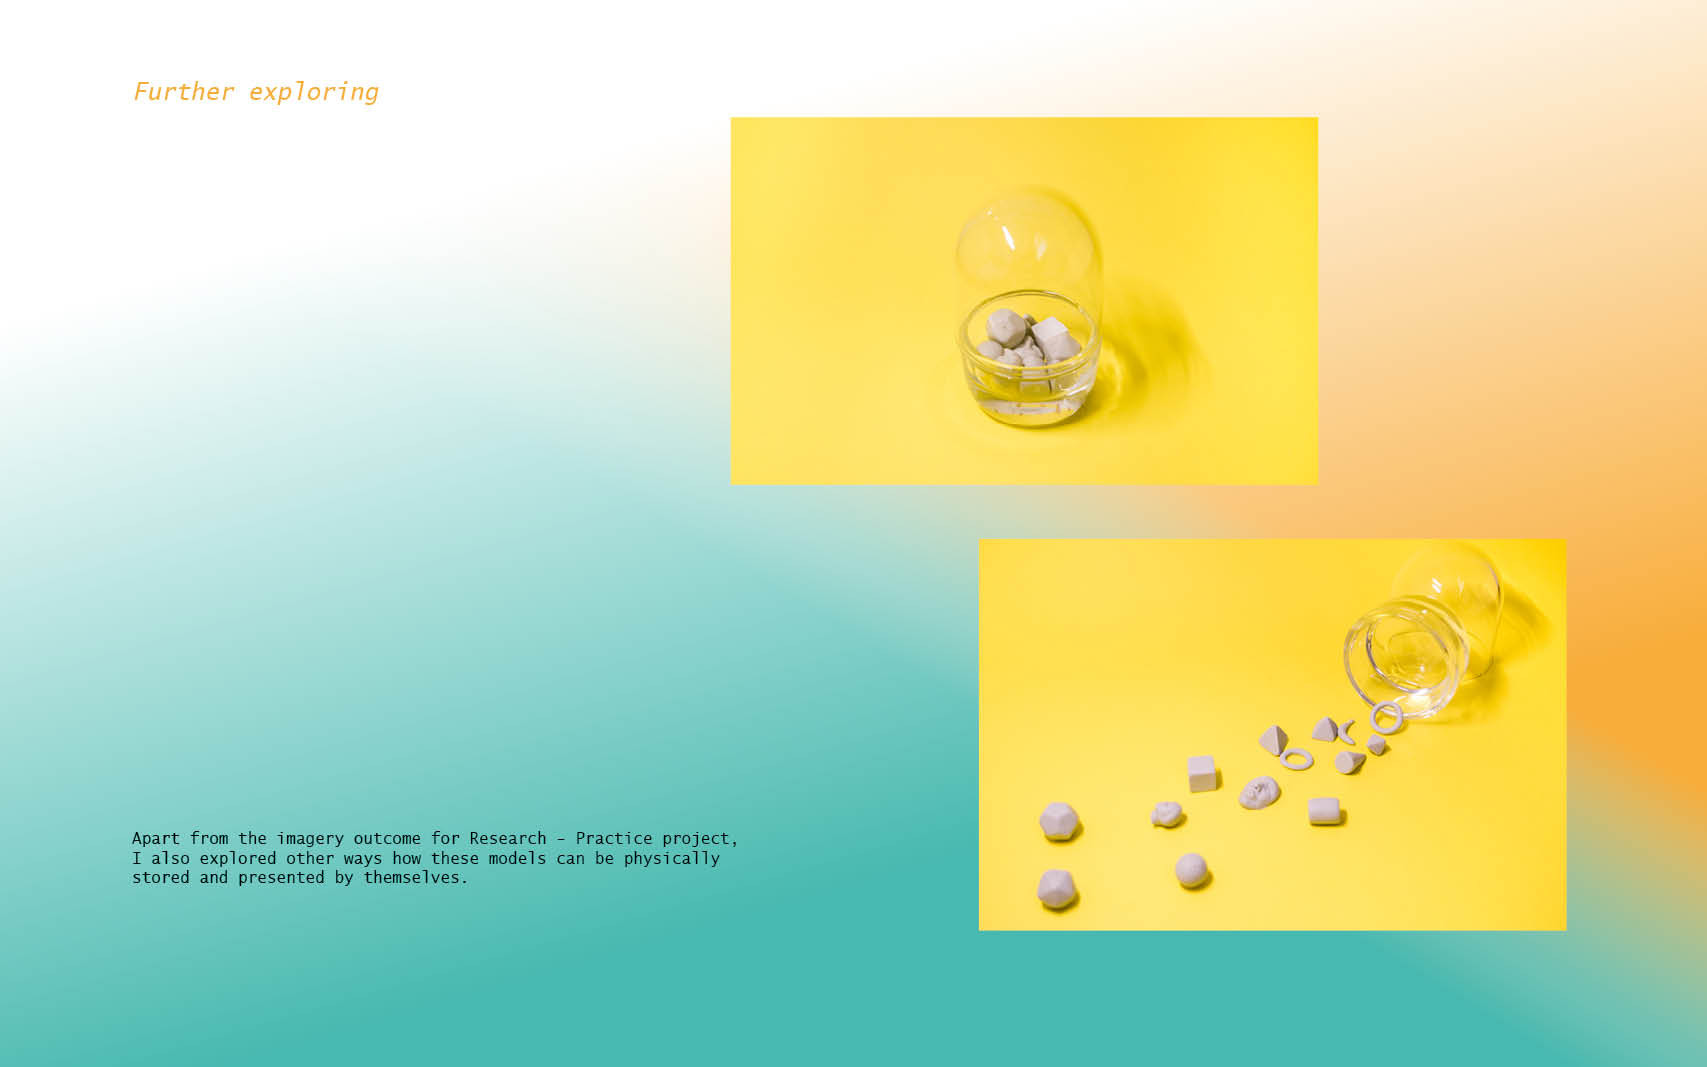 R-P process book 2019_03 small size16.jp